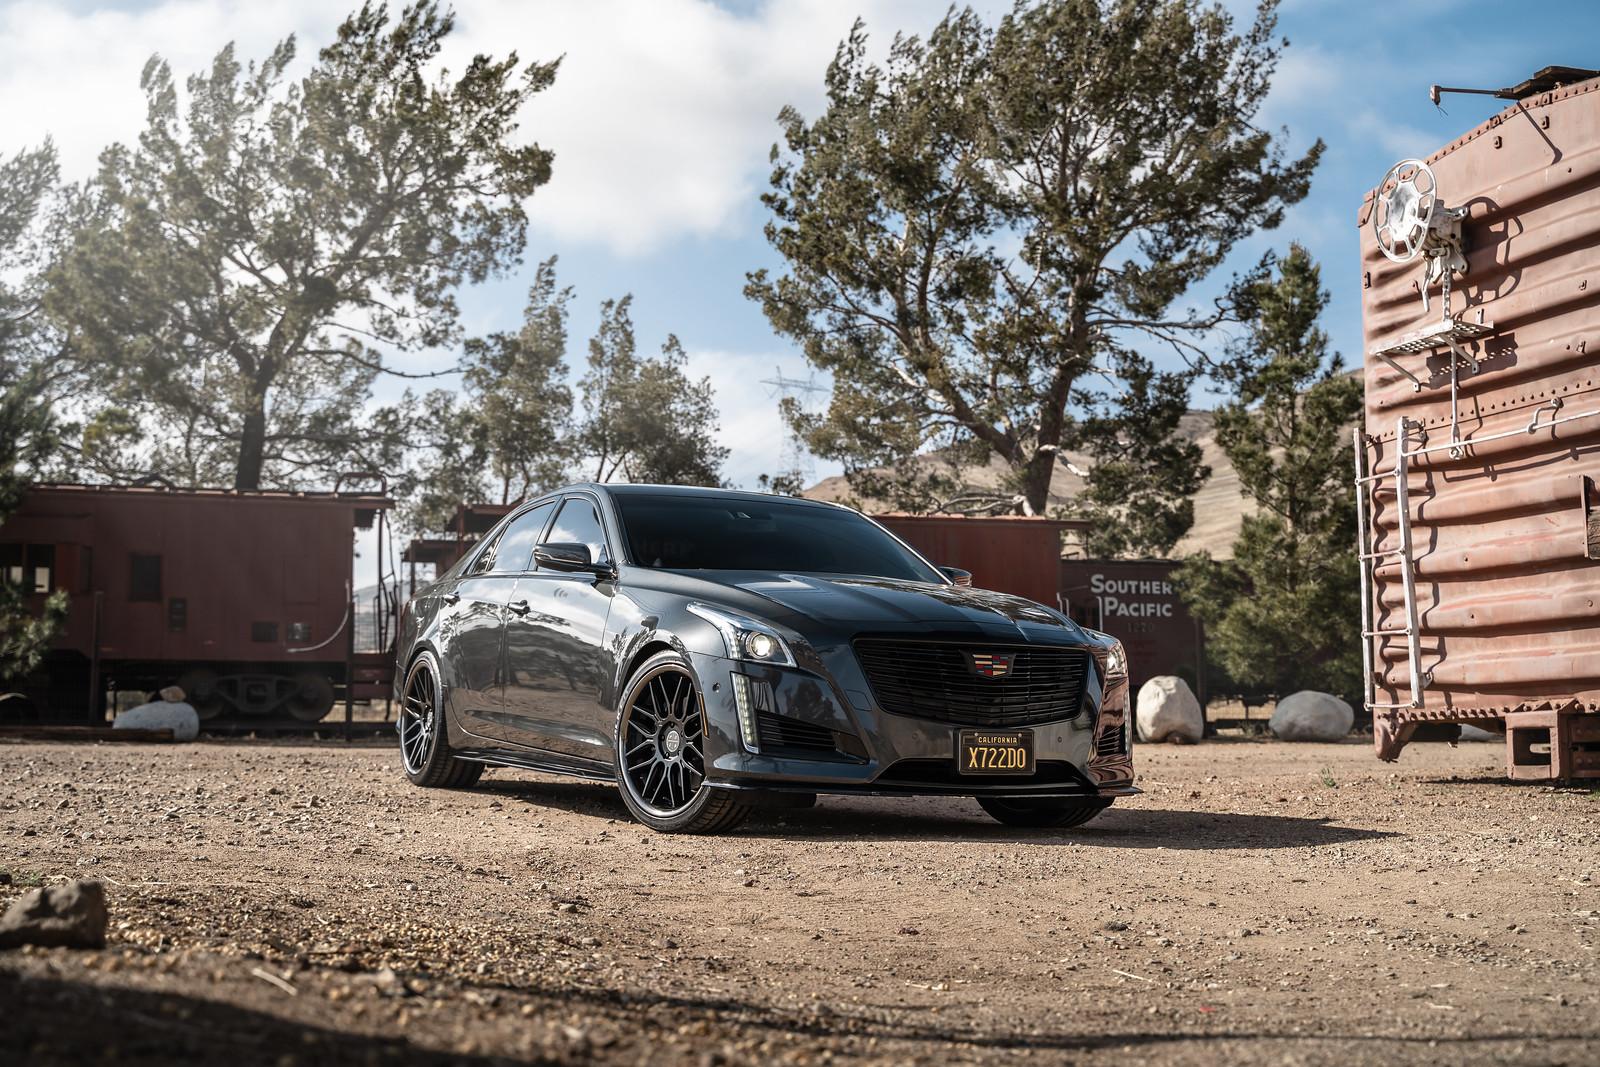 2014_Cadillac_CTS_V_Sport_BD27_Satin_Black_Black_Chrome_Lip_8